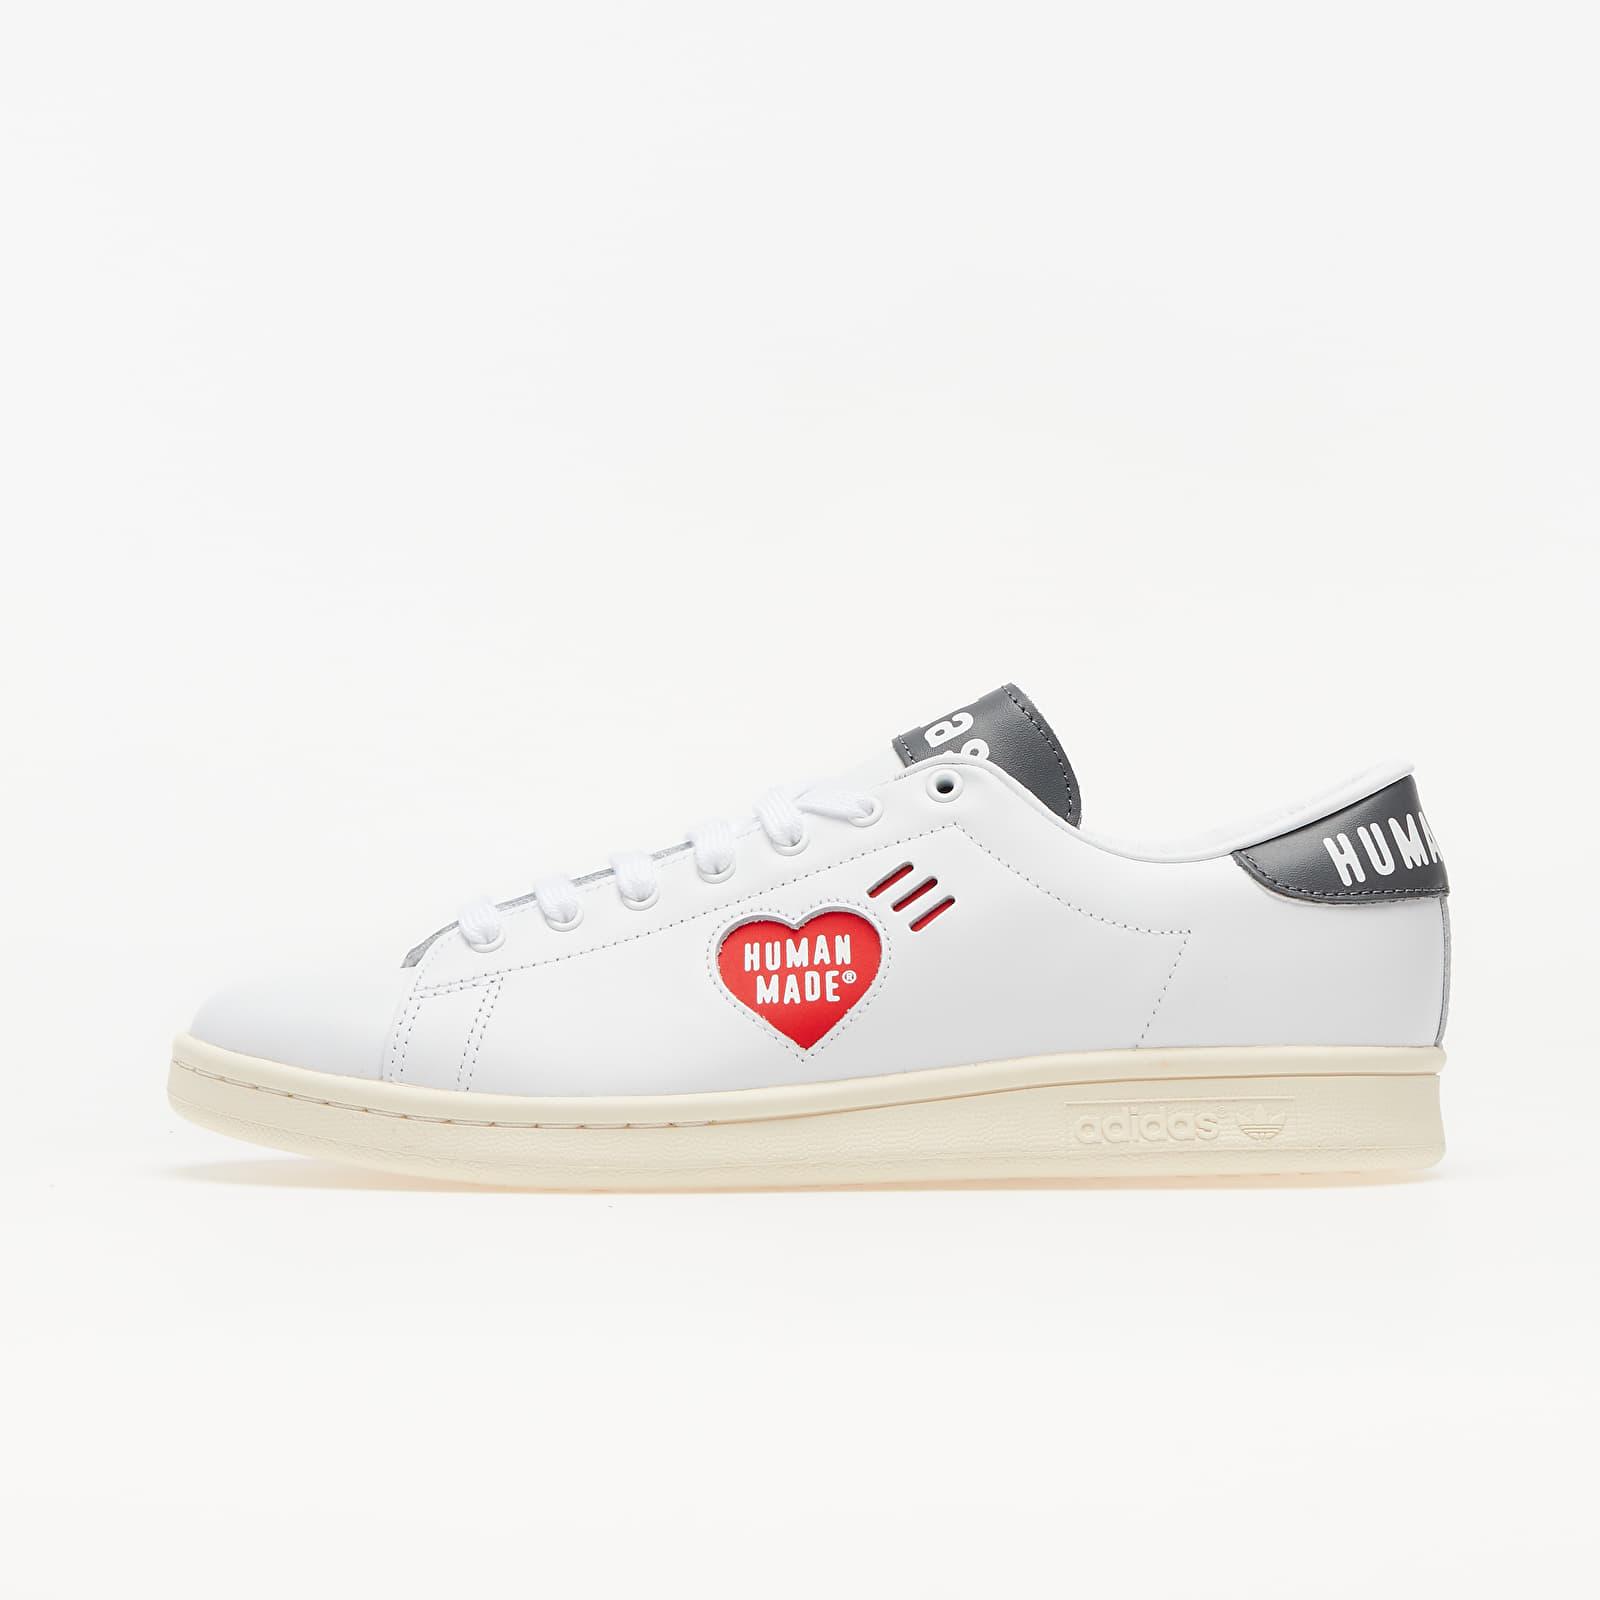 Men's shoes adidas Stan Smith Human